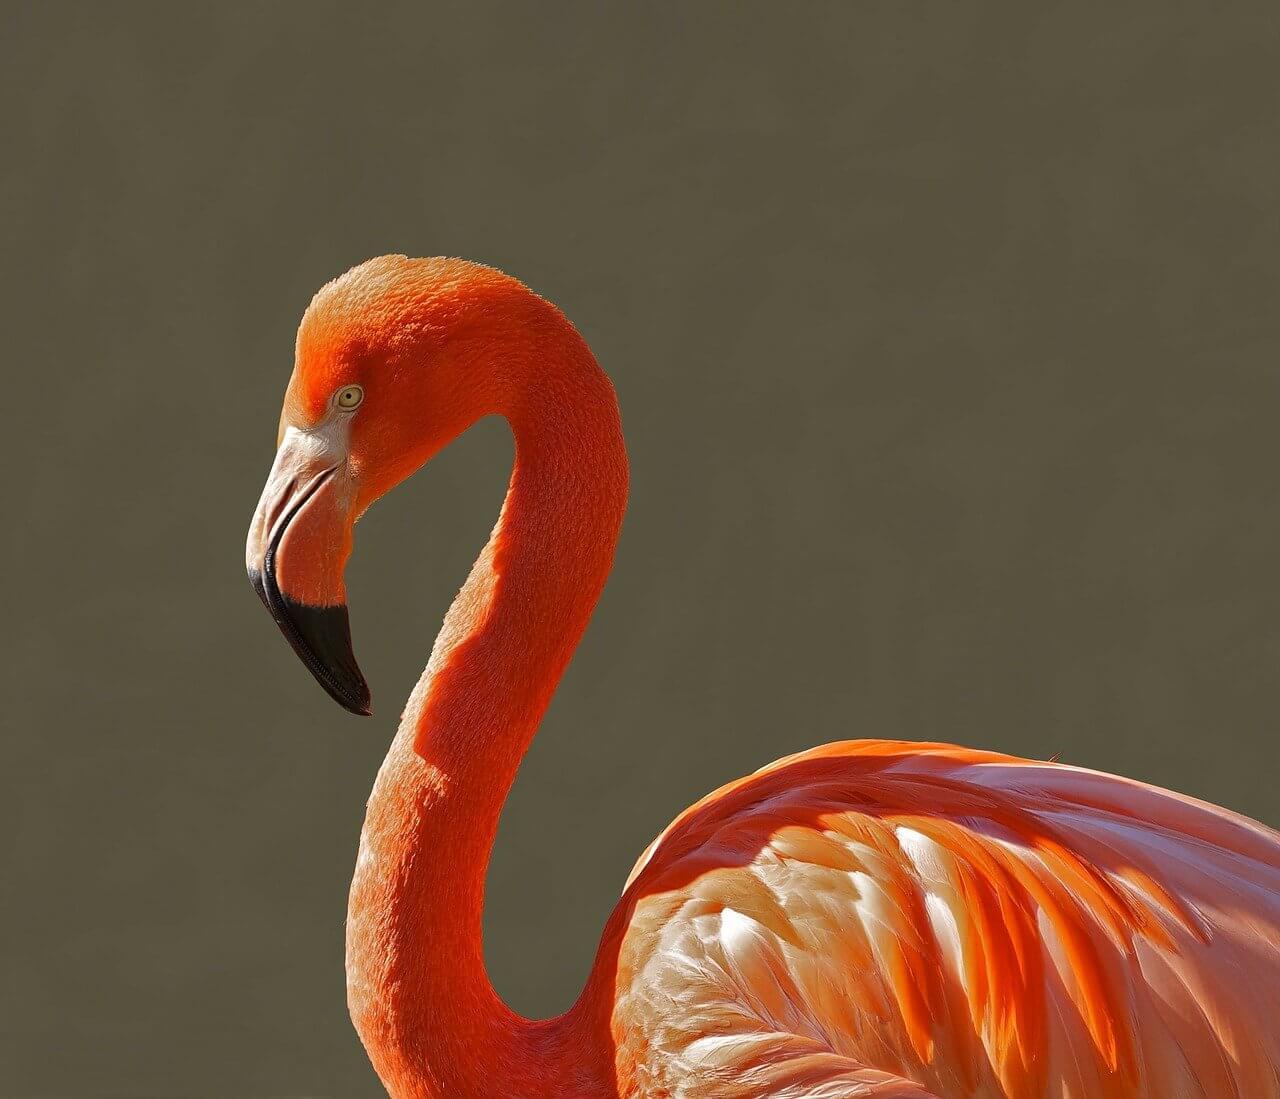 米津玄師 Flamingo